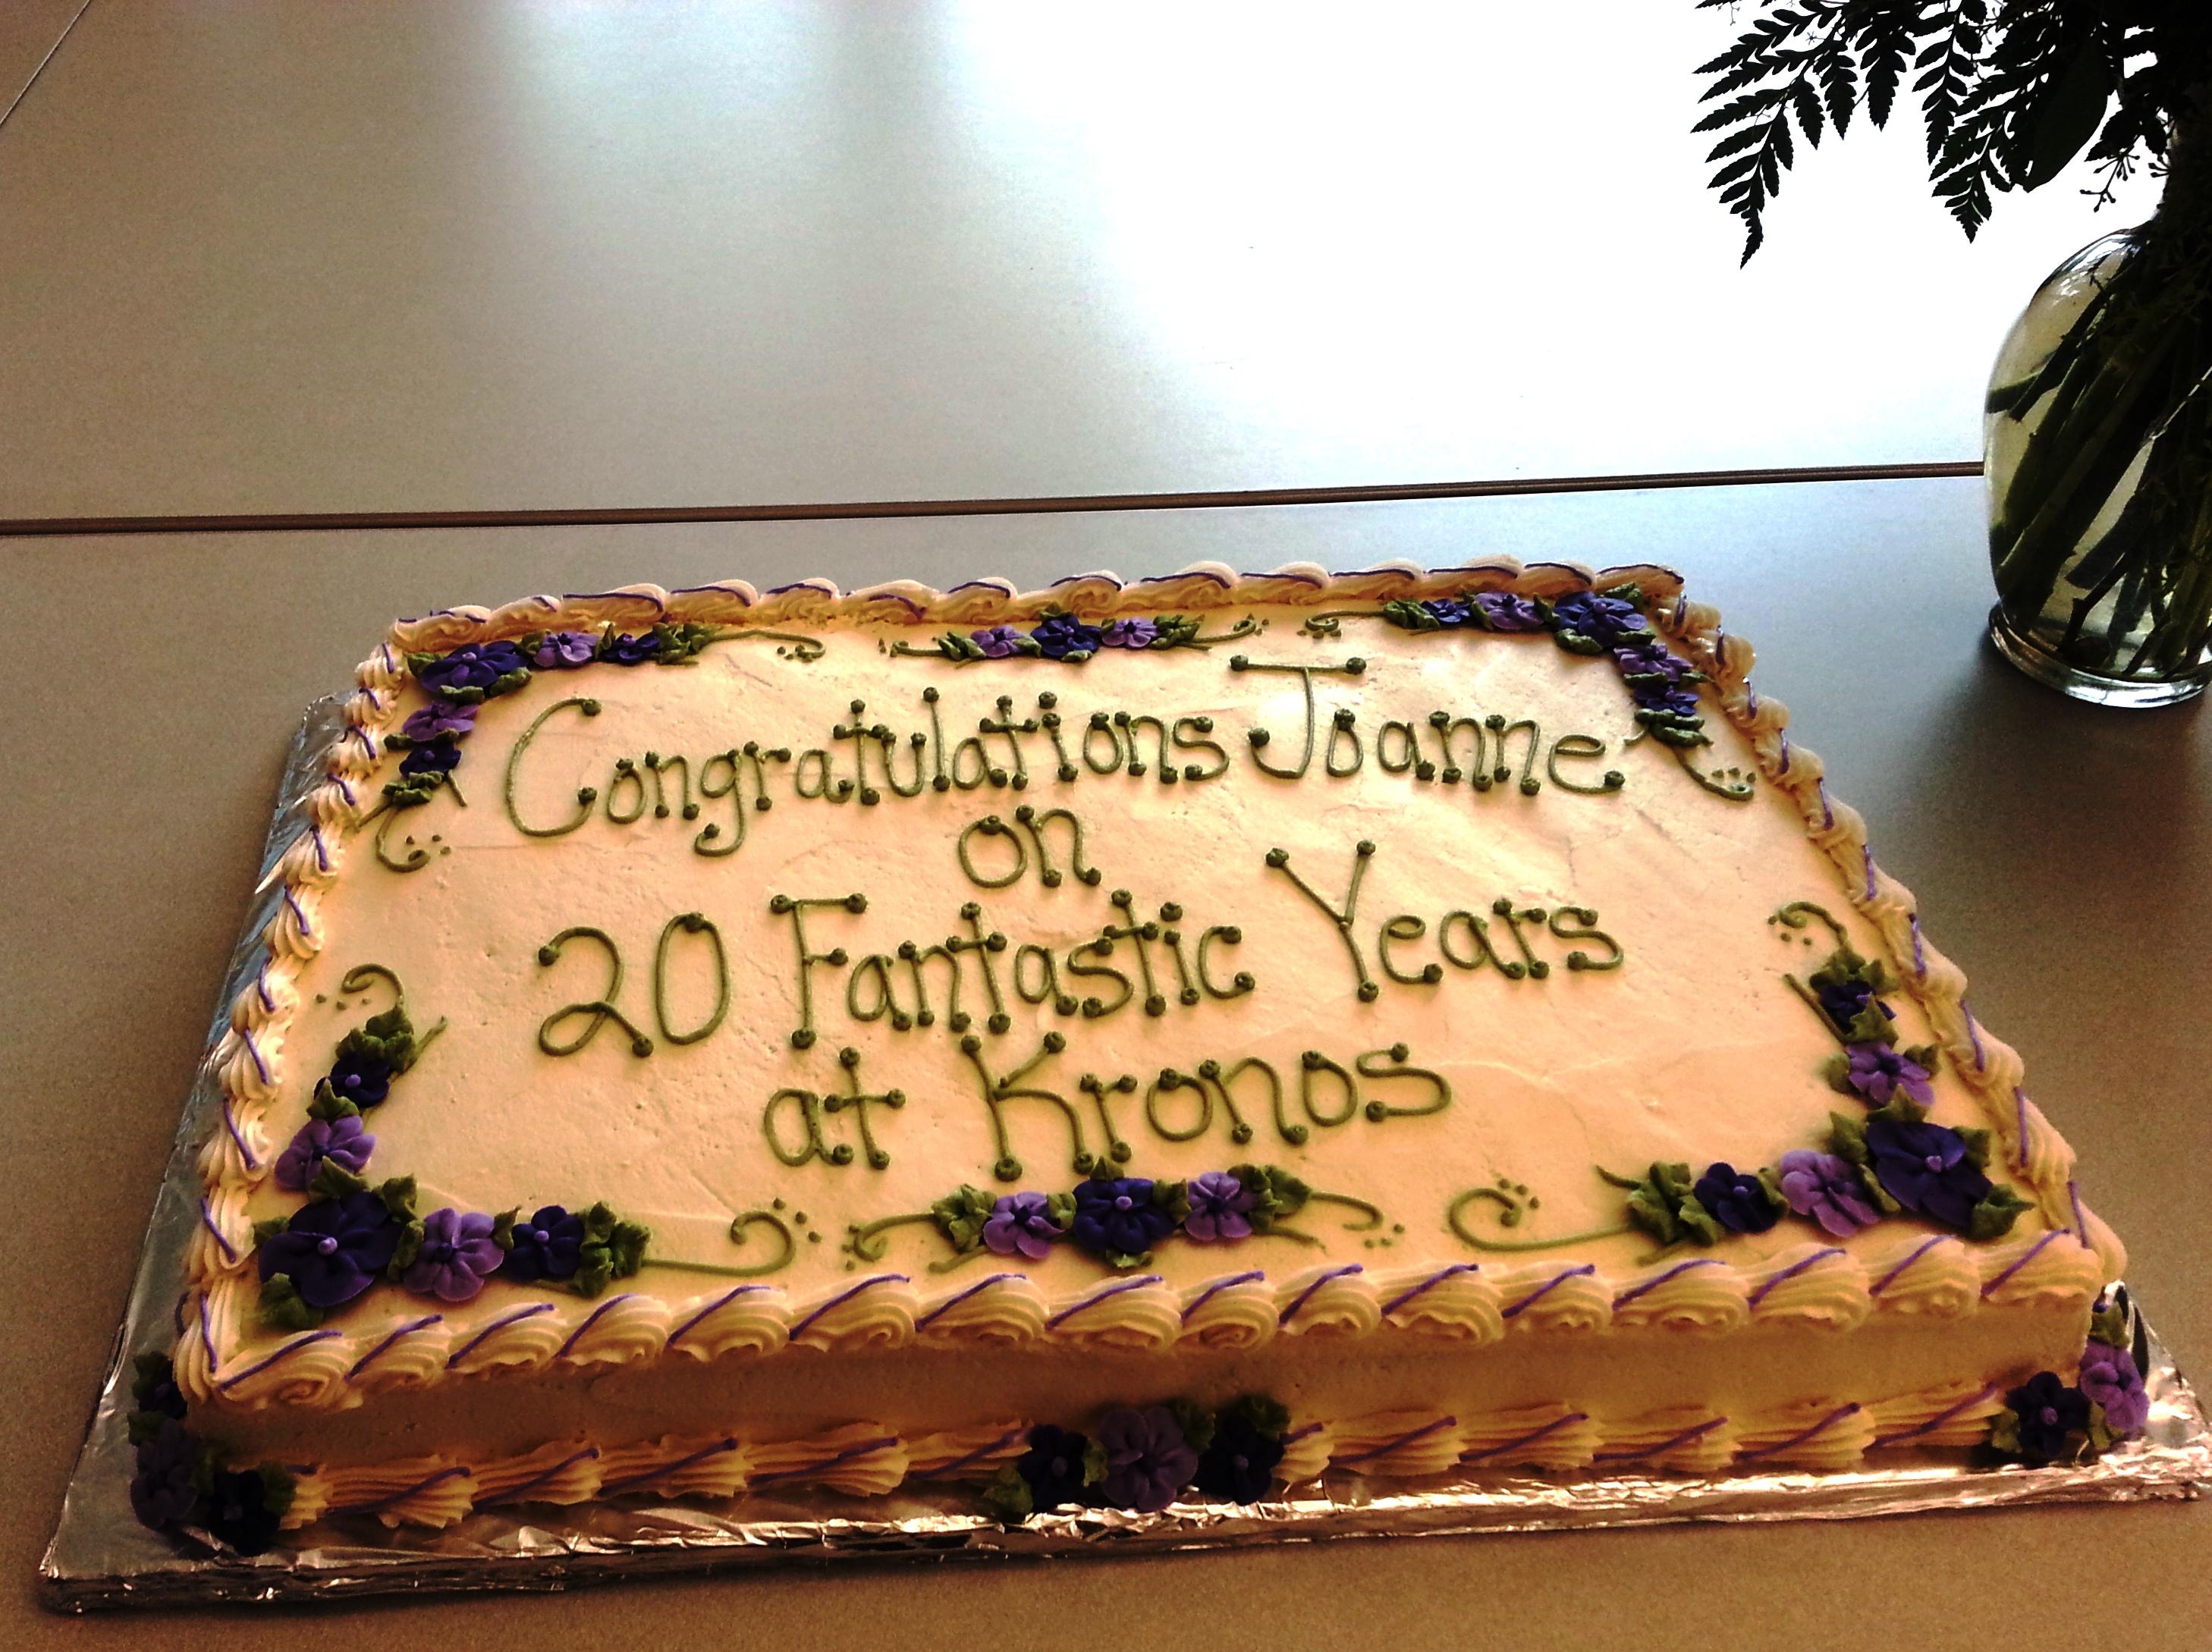 Employee anniversary year congratulations card